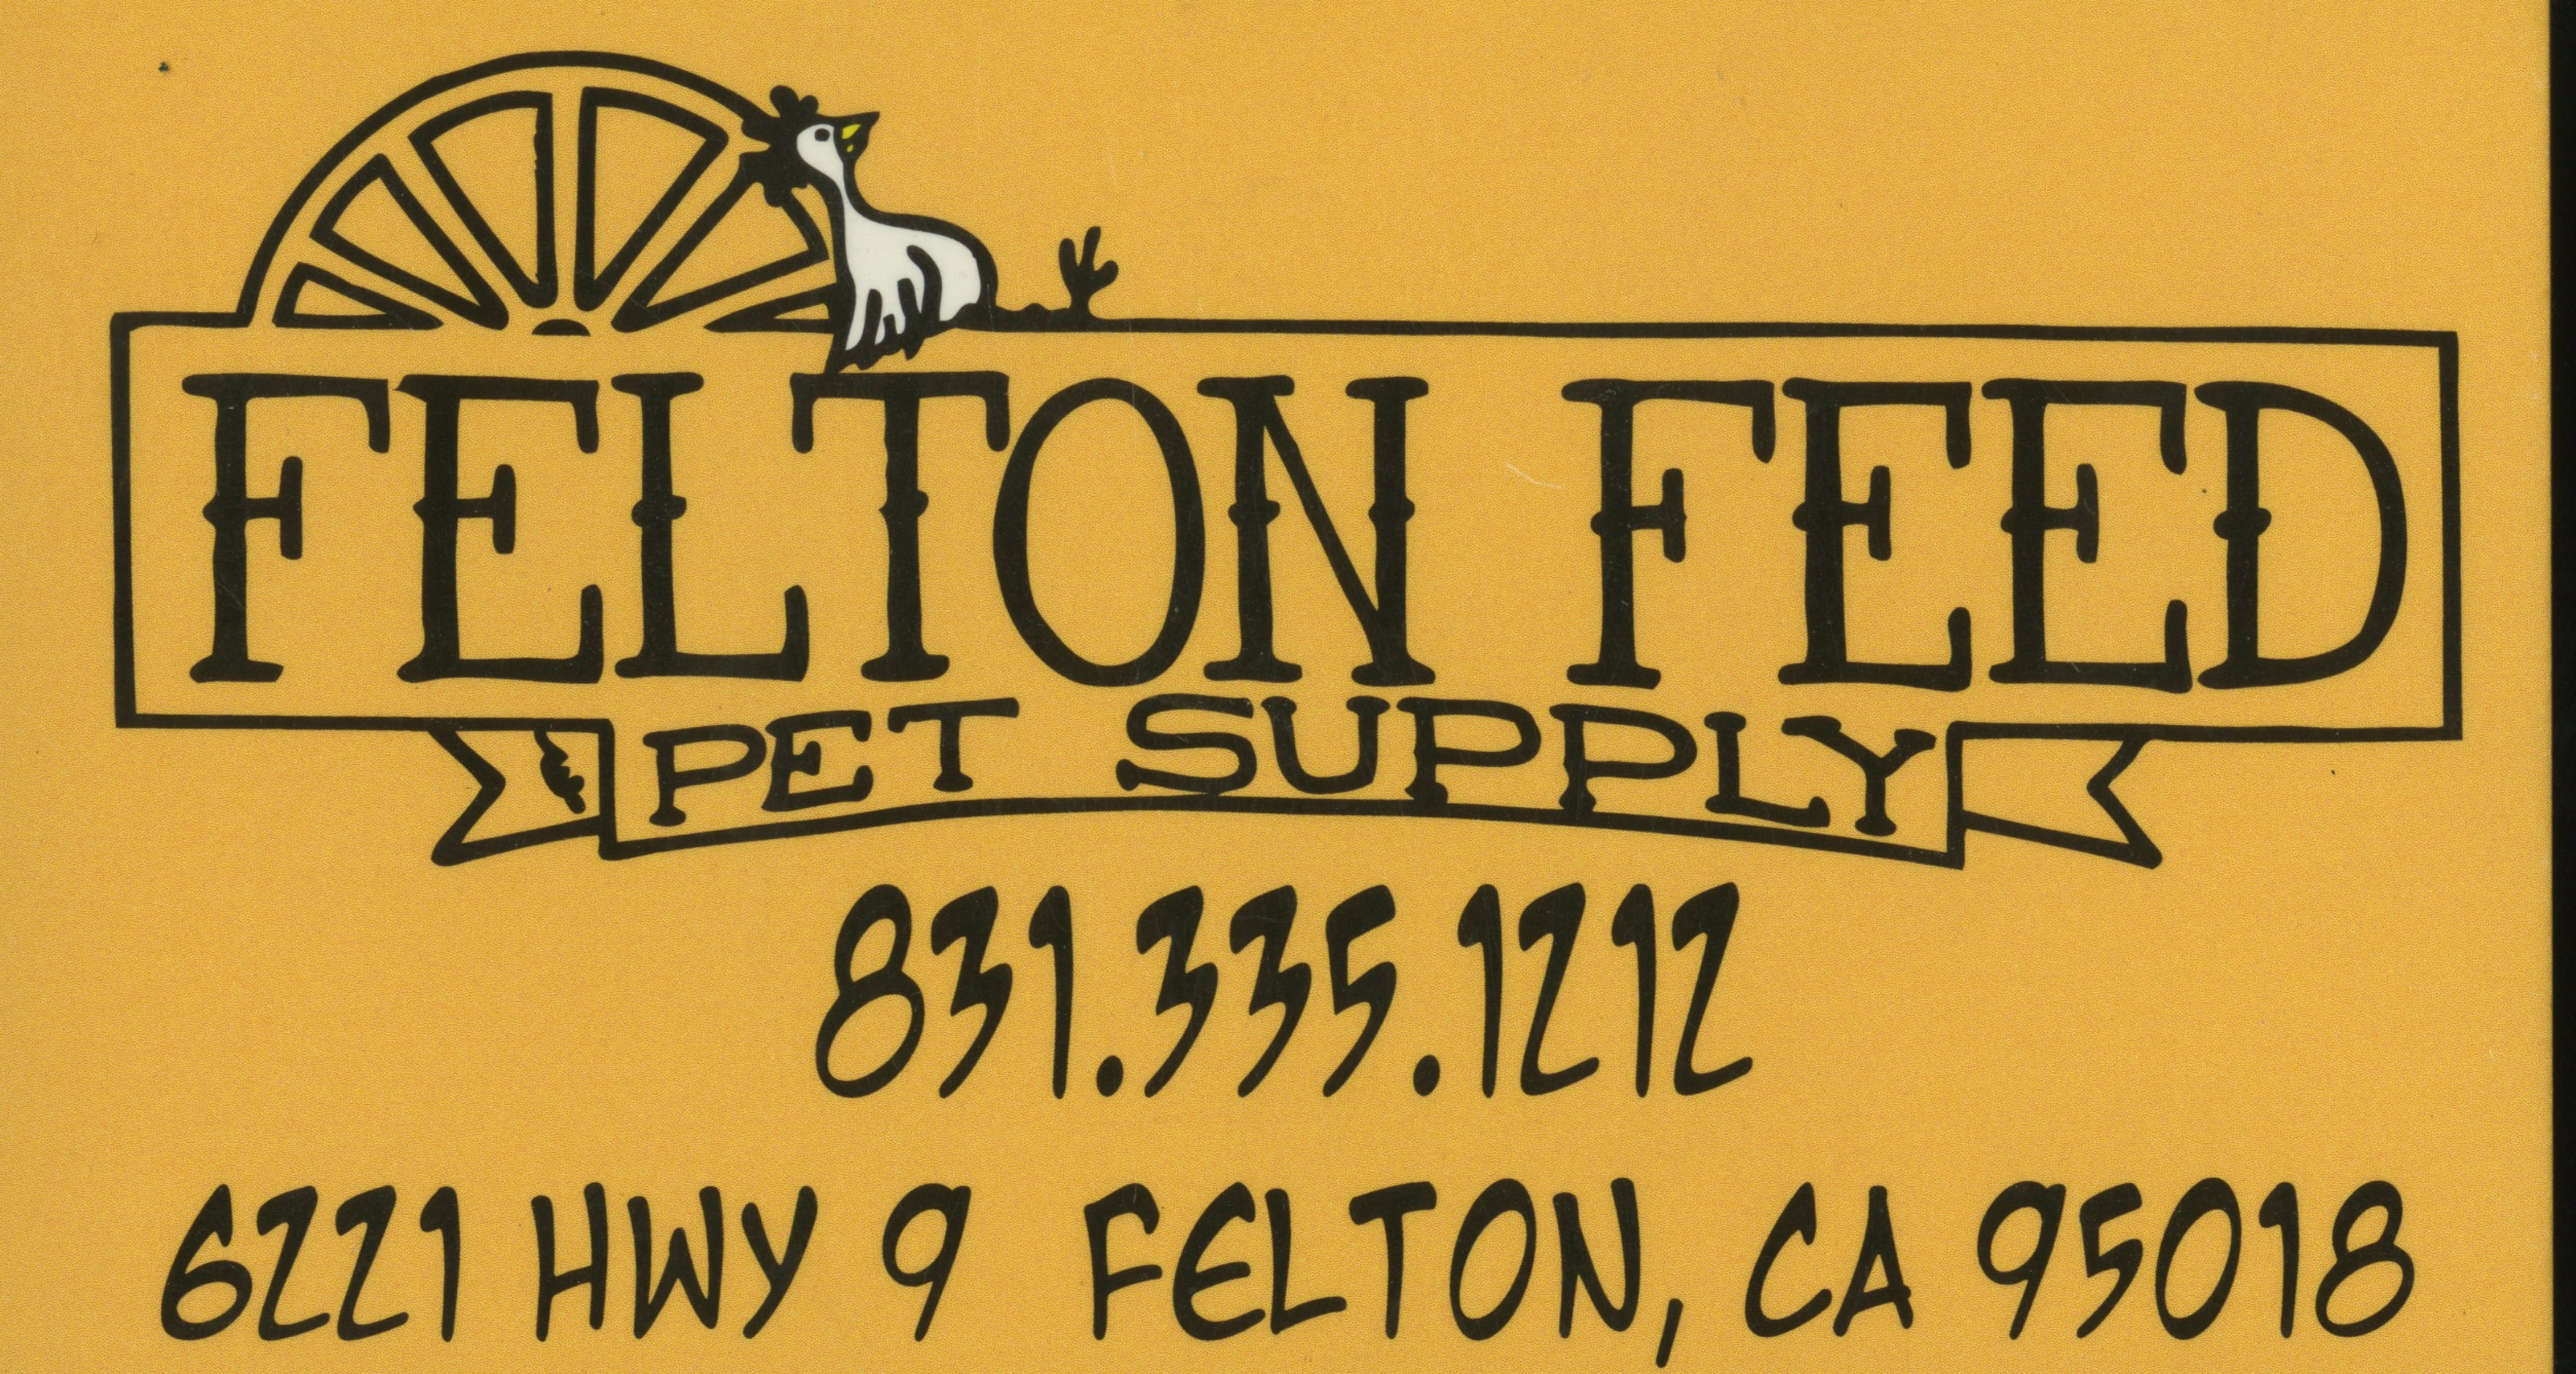 Felton Feed